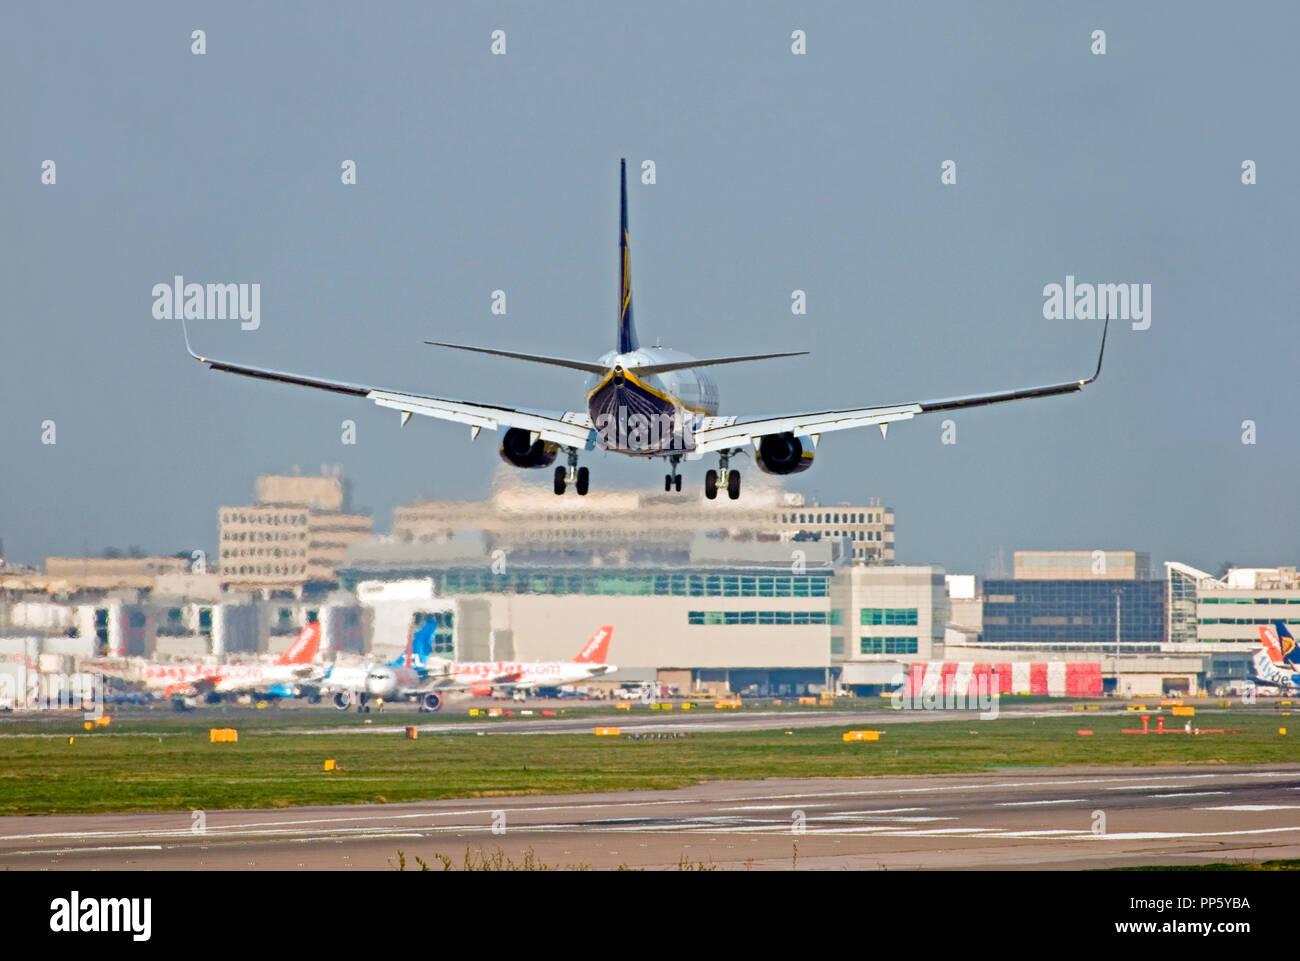 Ryanair Boeing 737-8AS aircraft landing at London Gatwick airport. - Stock Image